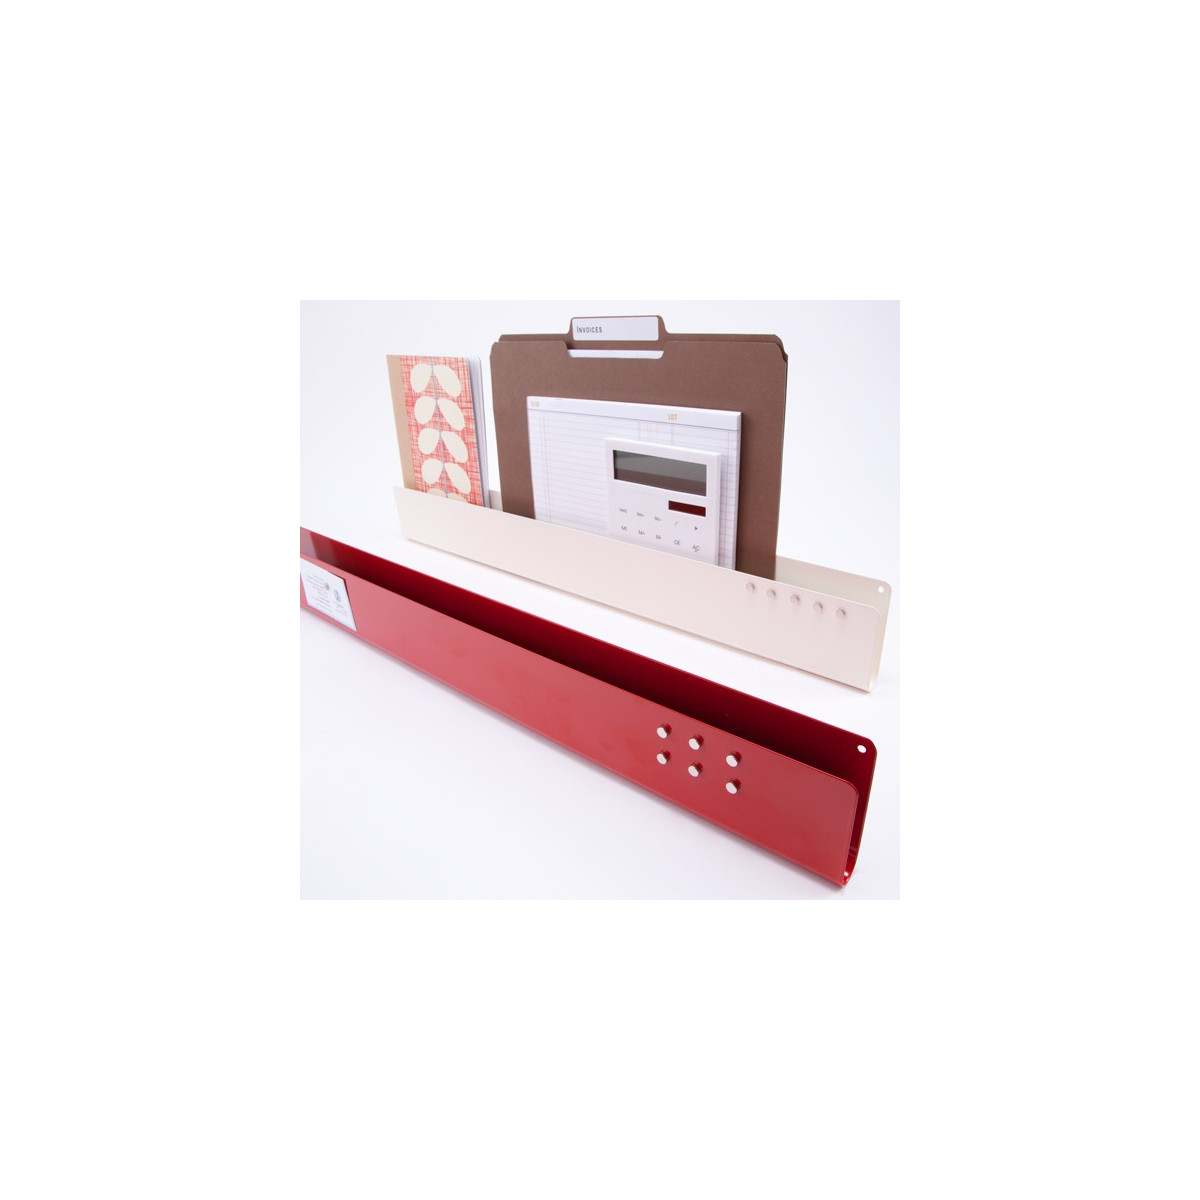 Vide poche mural rouge rangement courrier - Poche de rangement mural ...